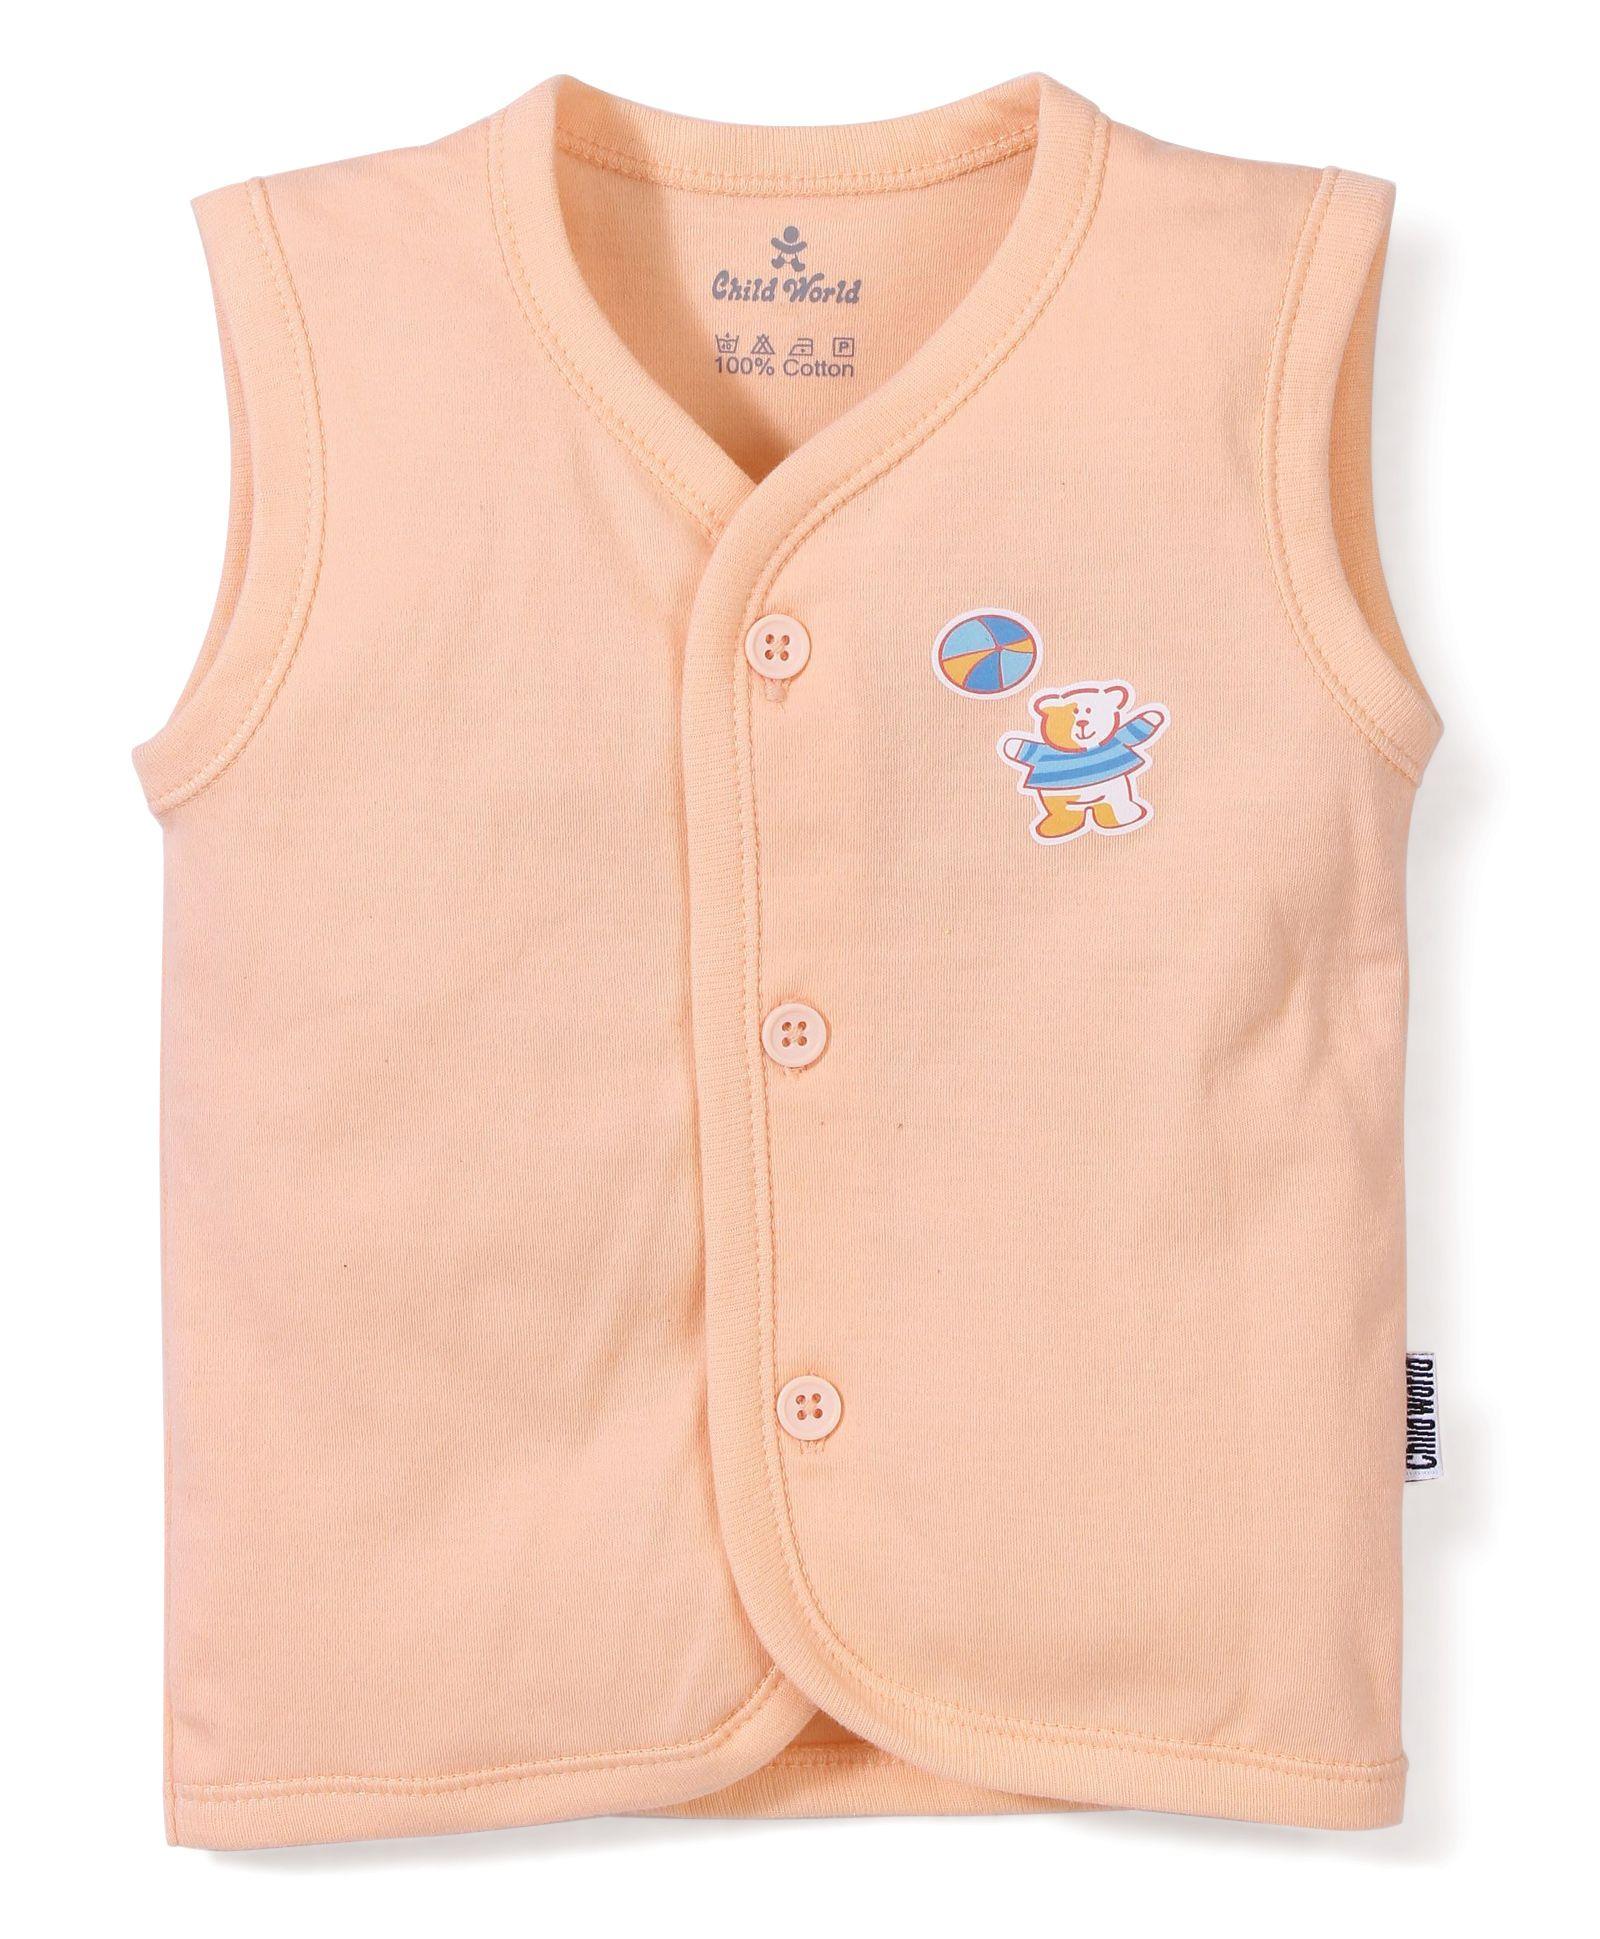 120b9350 Buy Child World Sleeveless Vest (Print May Vary) for Boys (0-3 ...